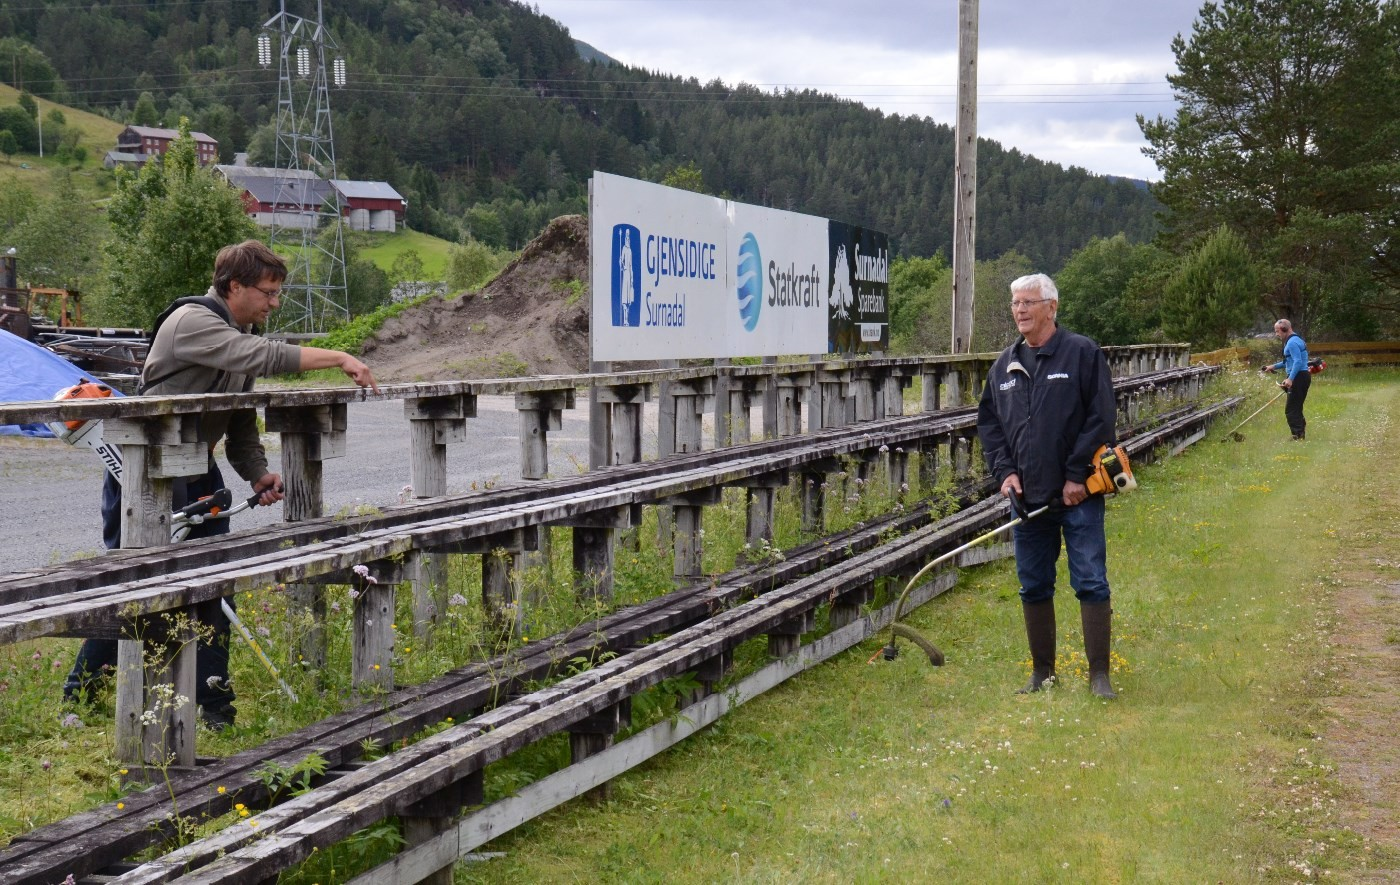 Slåttadugnad - frå venstre Carten Bohle, Gudmund Kvendset og bak Gudmund Husby.  Arkivfoto: Jon Olav Ørsal